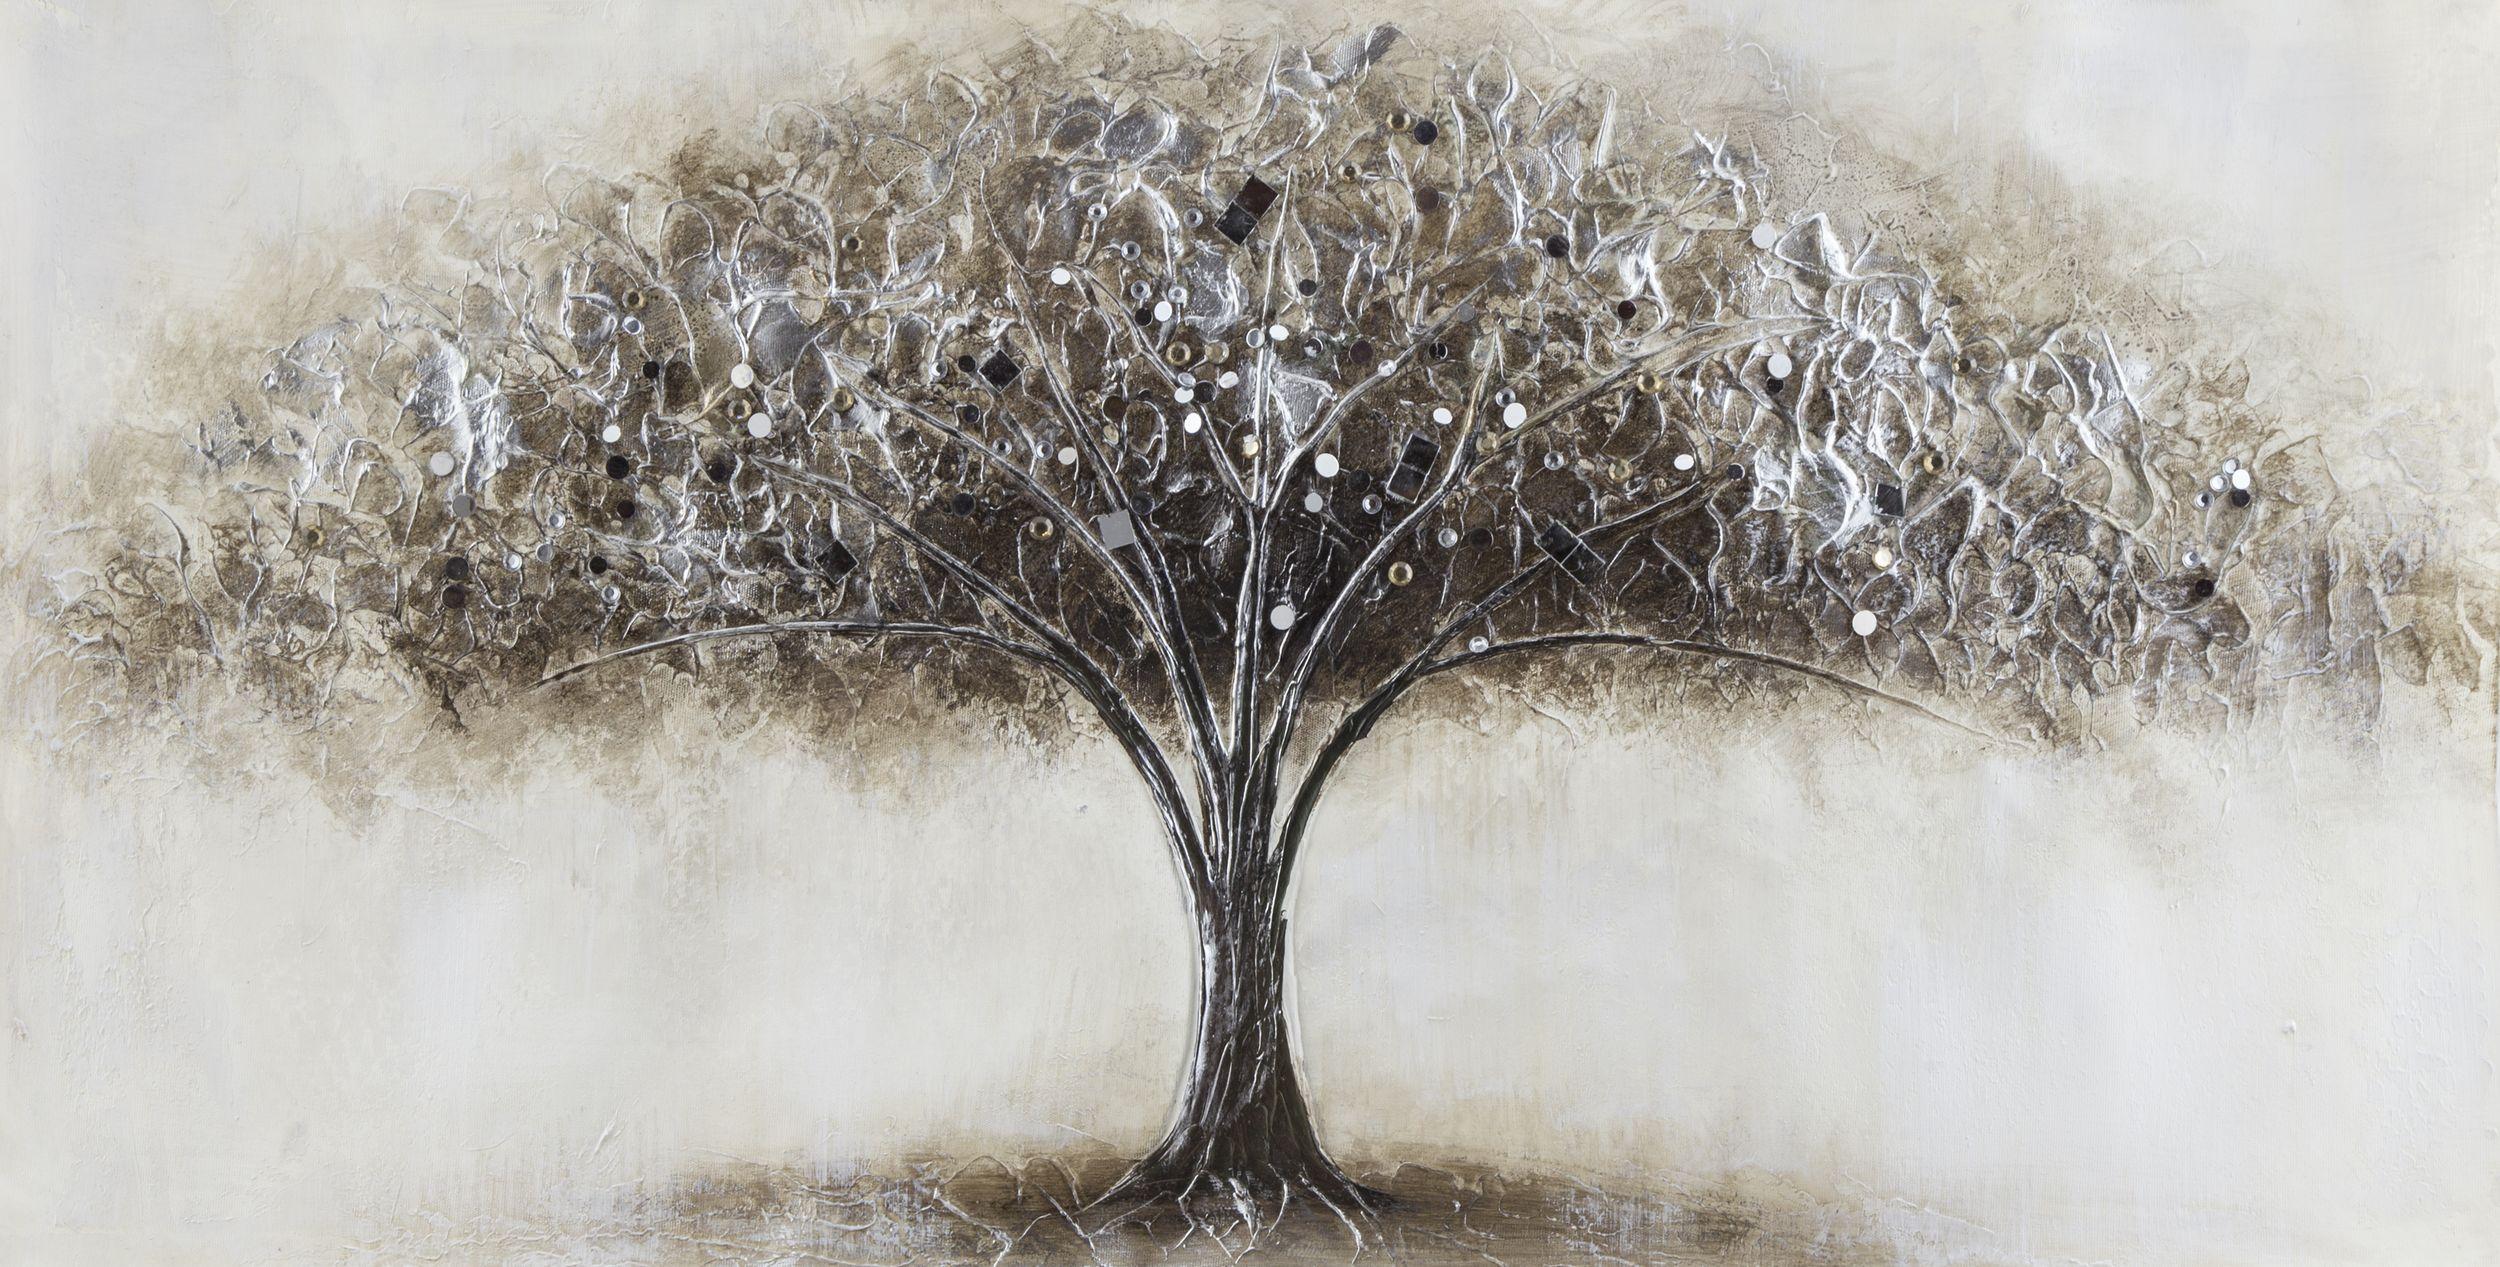 Leinwandbild 40x80cm ORIGINAL NESTO, TREE II